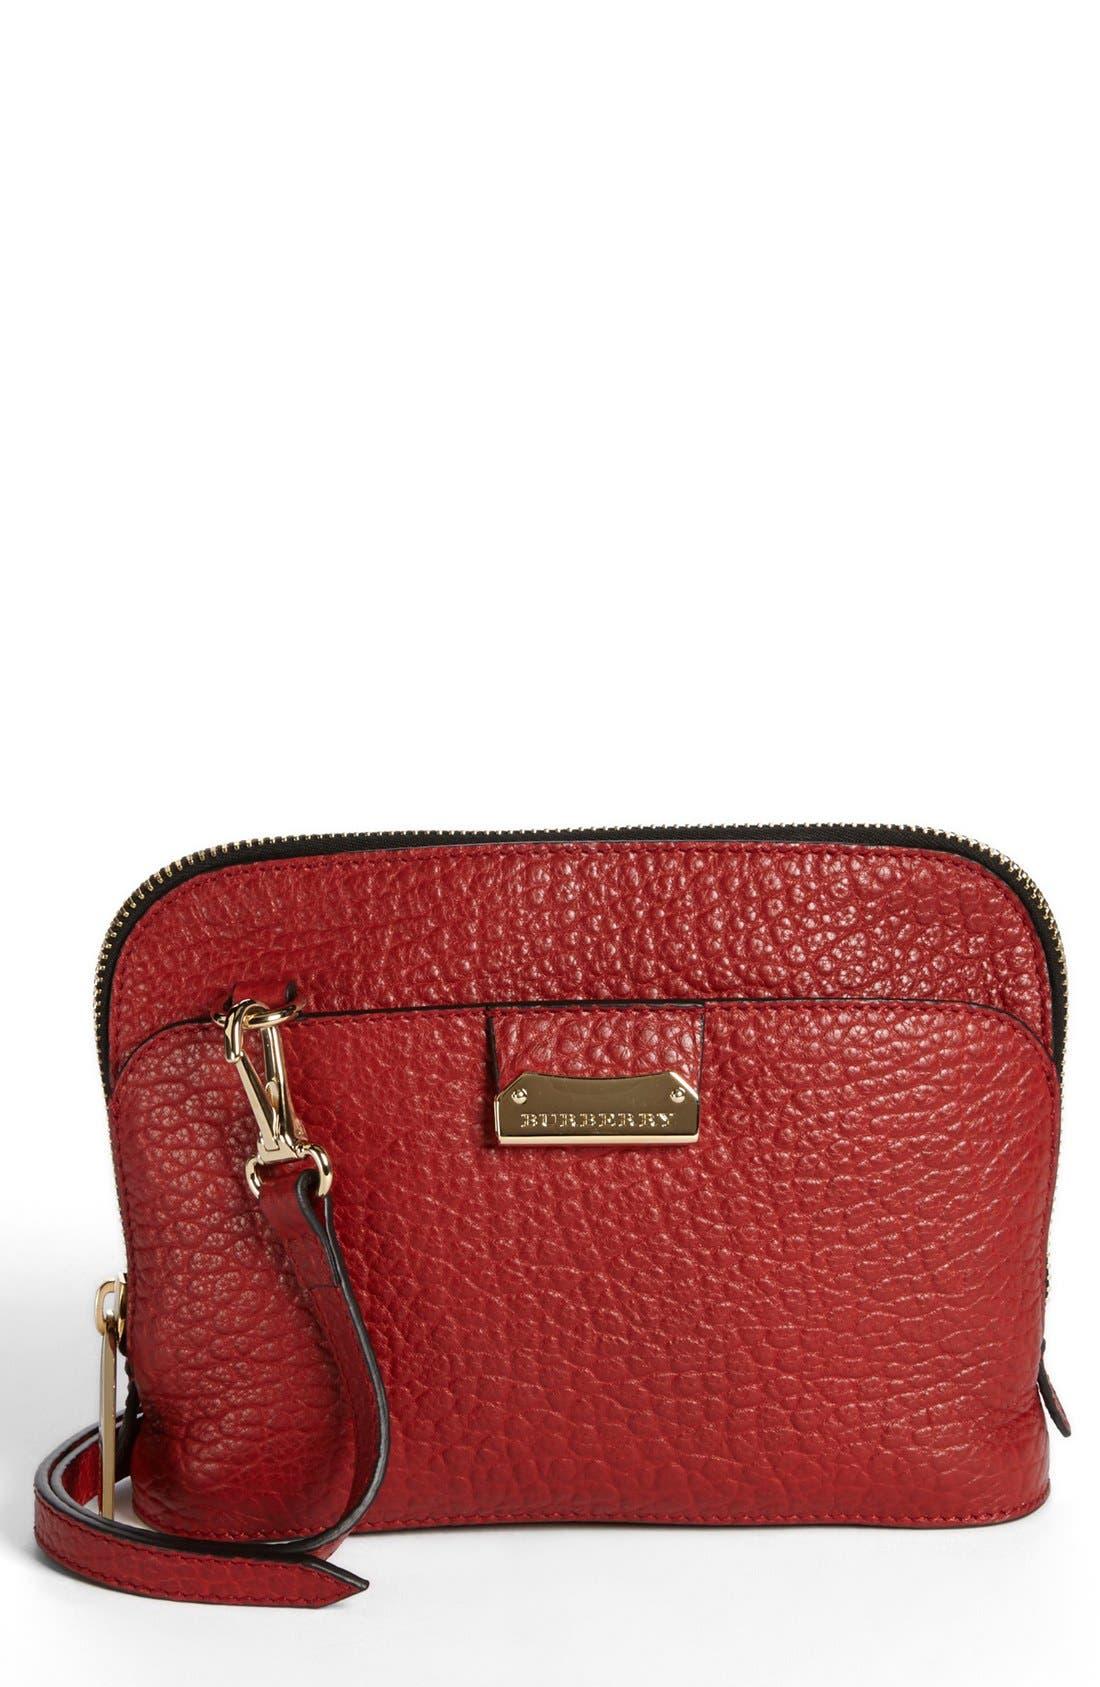 BURBERRY, 'Small Harrogate' Leather Crossbody Bag, Main thumbnail 1, color, 608